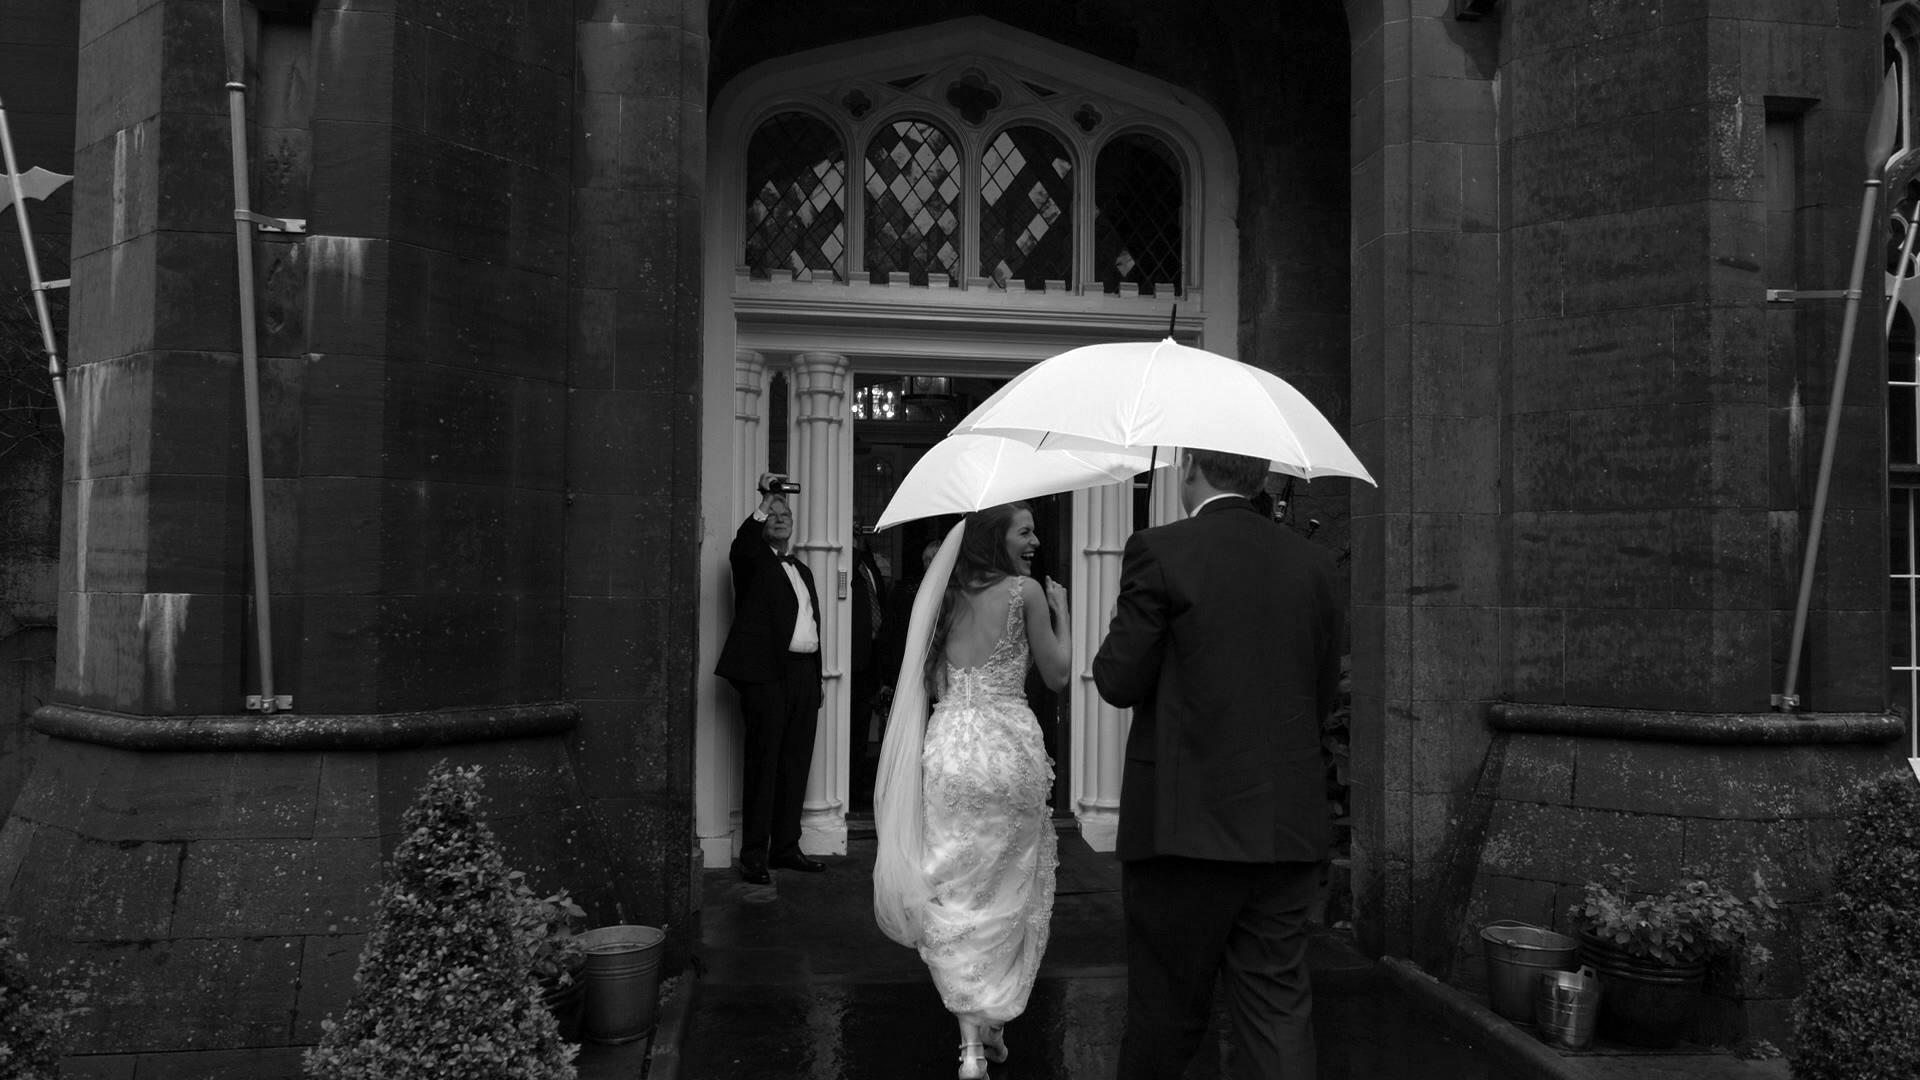 DRUMTOCHTY-SUMMER-WEDDING (15).jpg